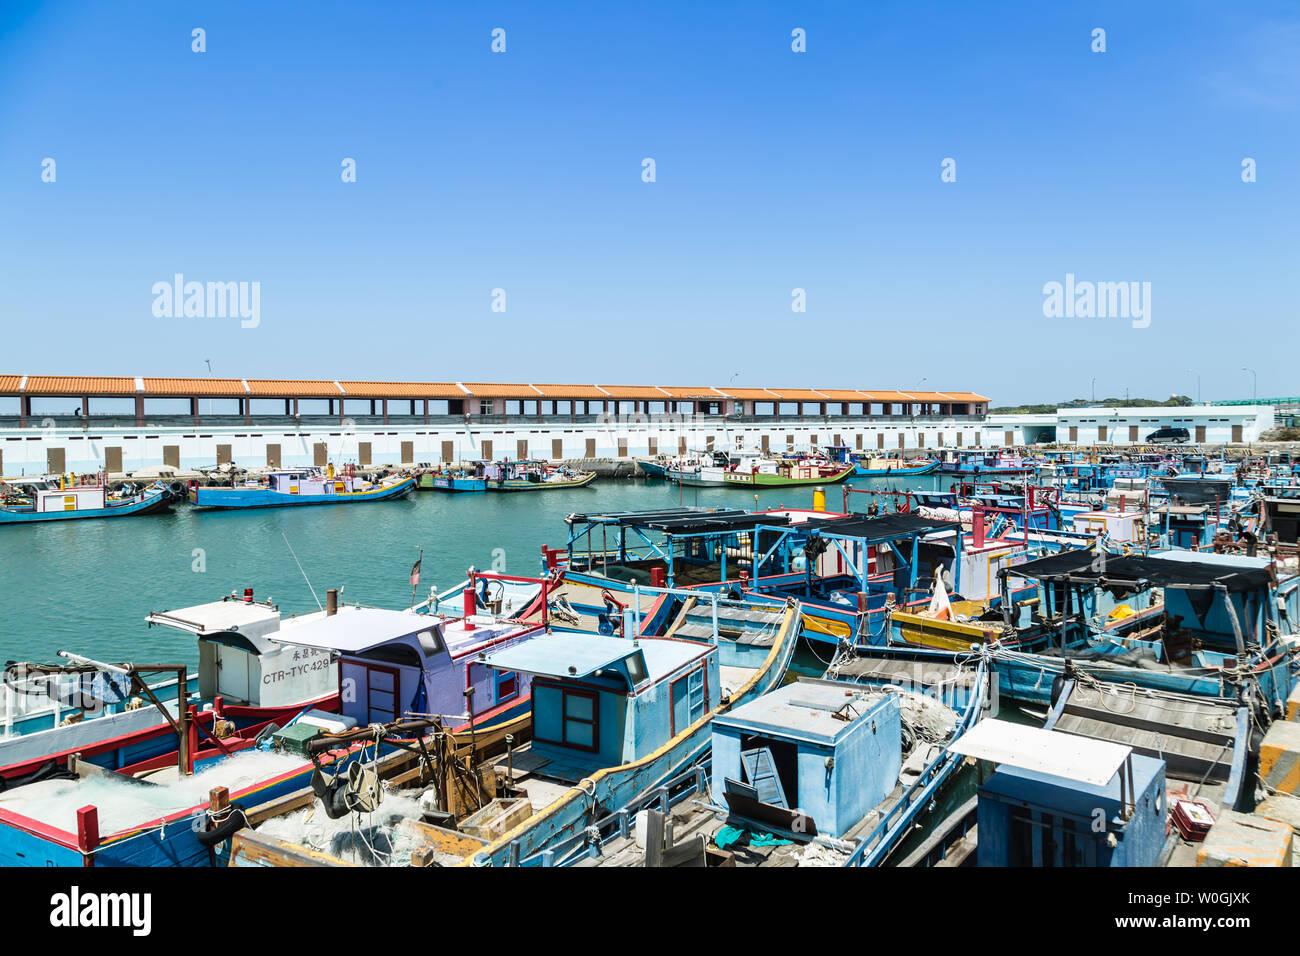 Taiwan,Taipei-05 SEP 2017: Taiwan Zhuwei Fish Harbor day time view - Stock Image